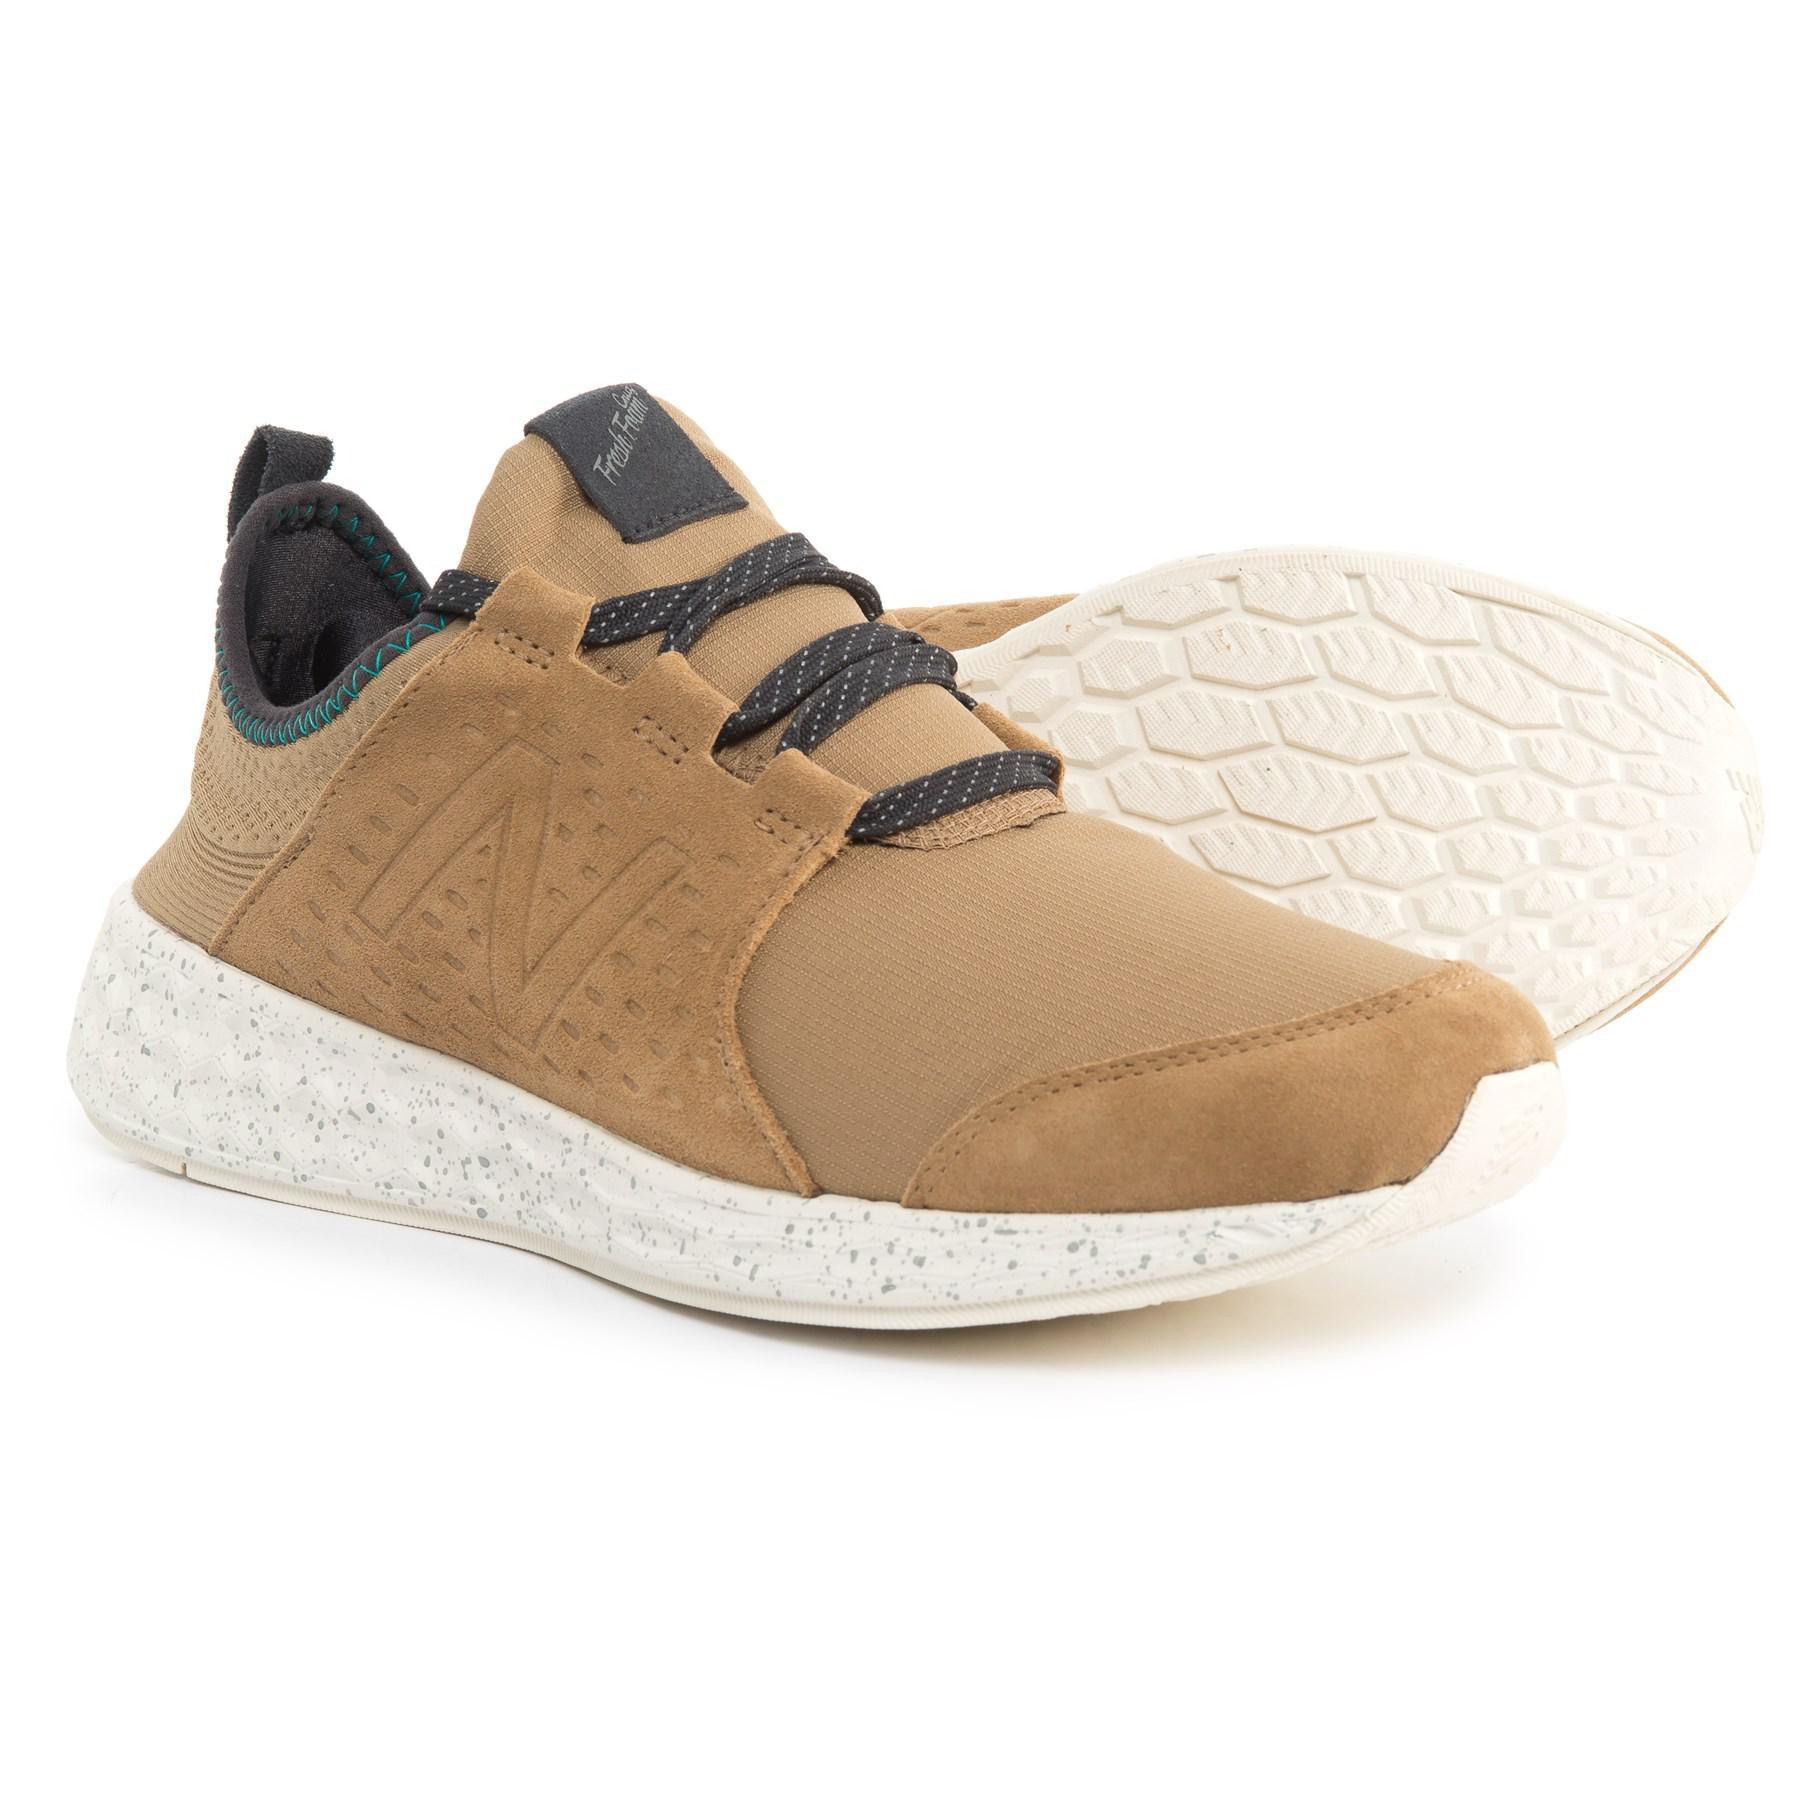 fd115f6228d10 New Balance Fresh Foam® Cruz Protect Pack Cross-training Shoes (for ...